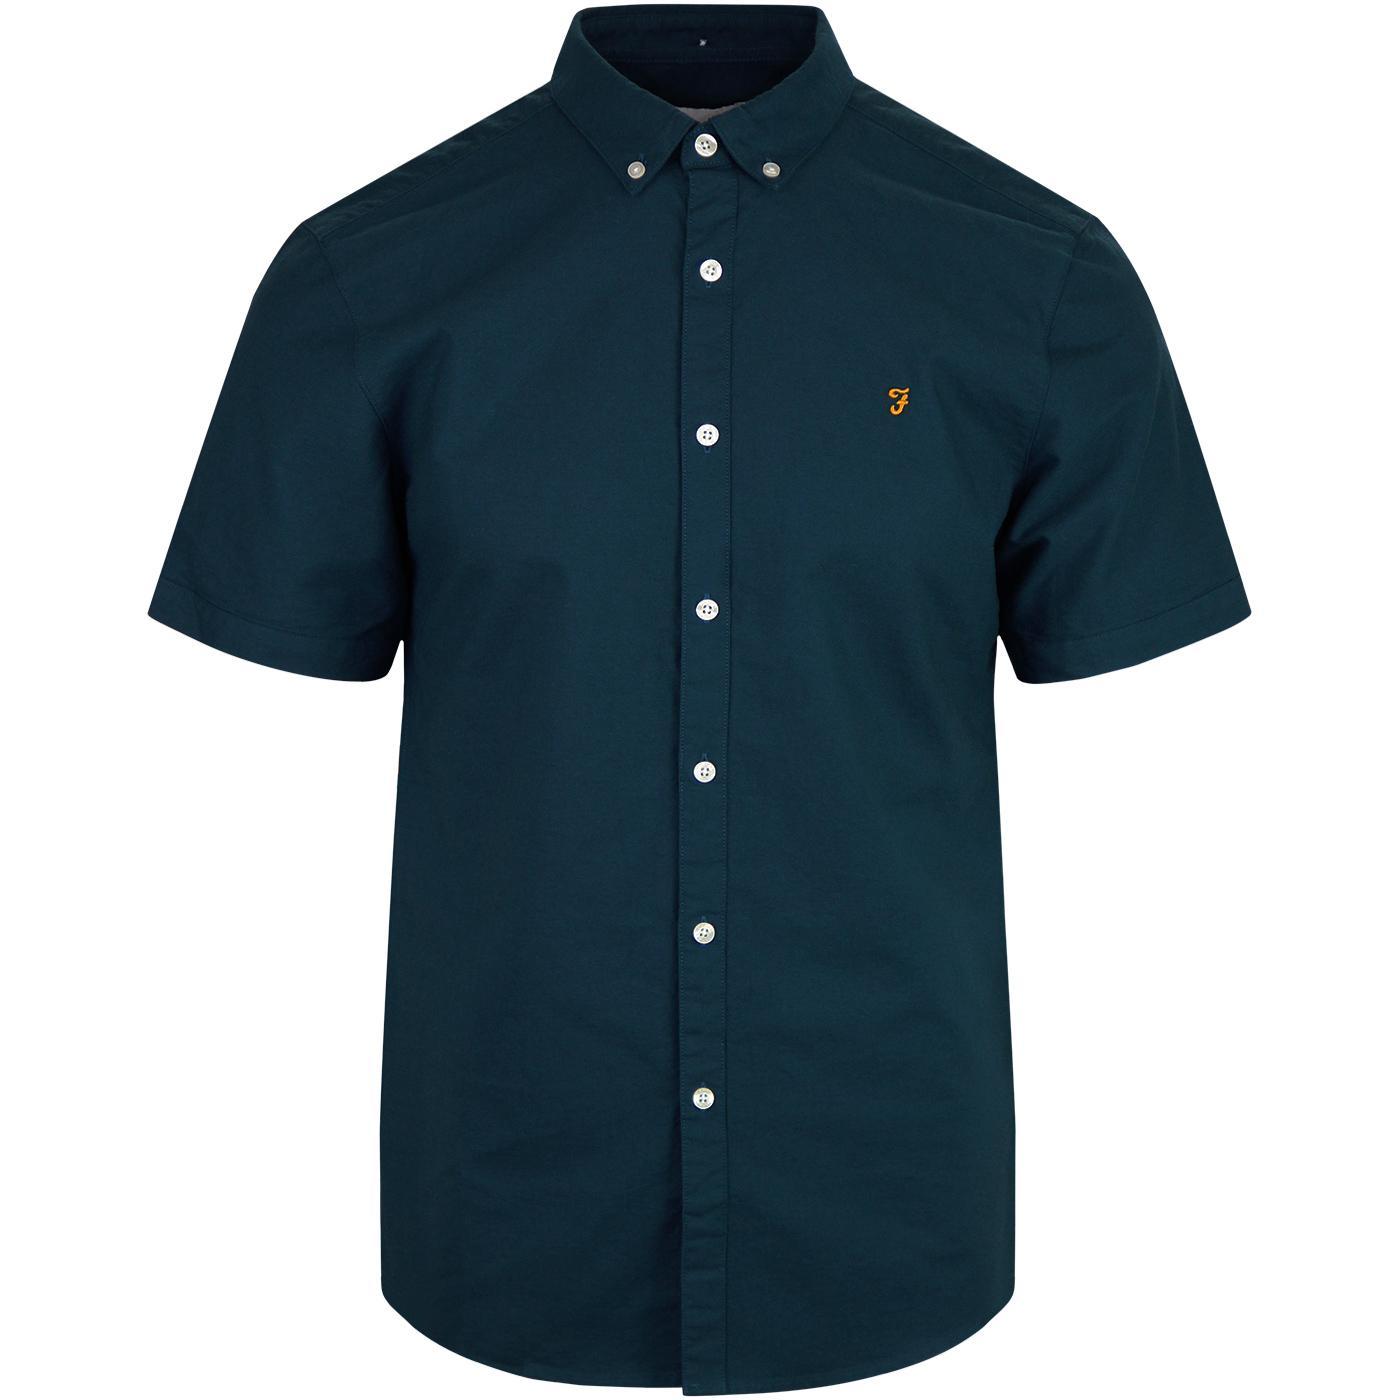 Brewer FARAH Mod Slim S/S Oxford Shirt (Blue Star)